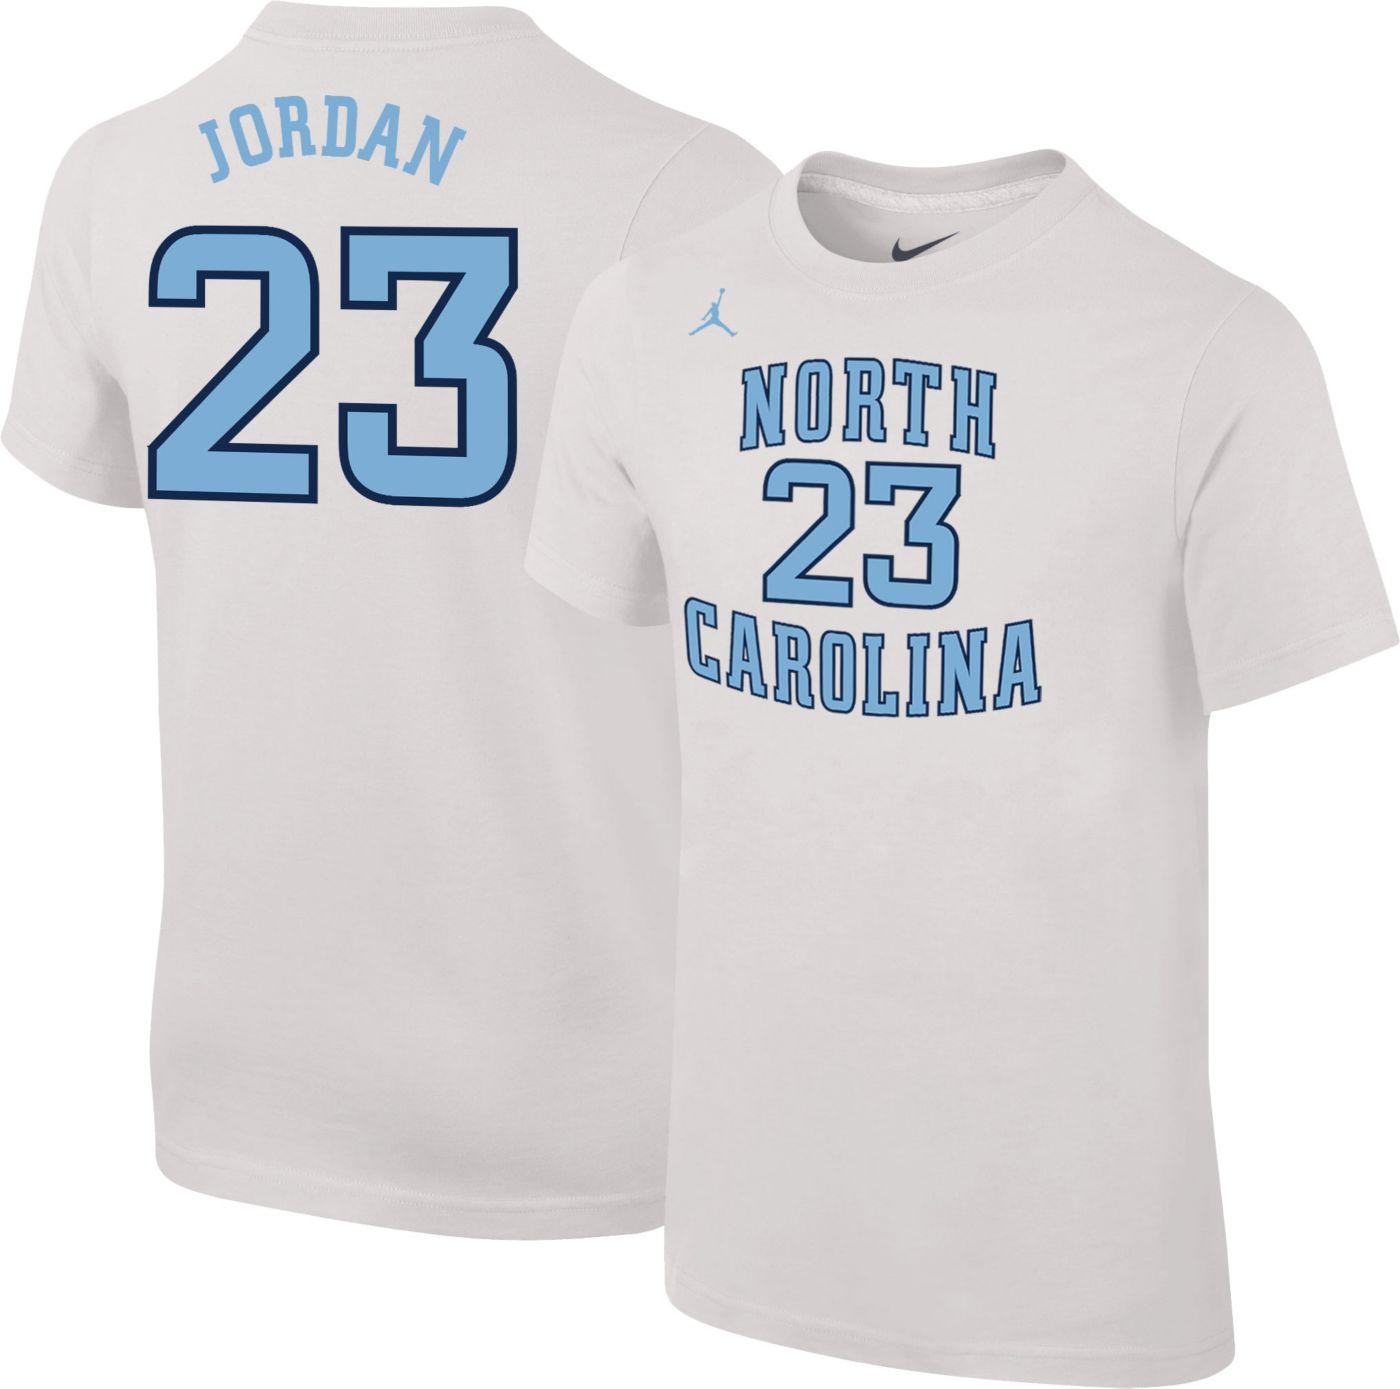 Jordan Youth North Carolina Tar Heels Michael Jordan #23 Future Star Replica Basketball Jersey White T-Shirt